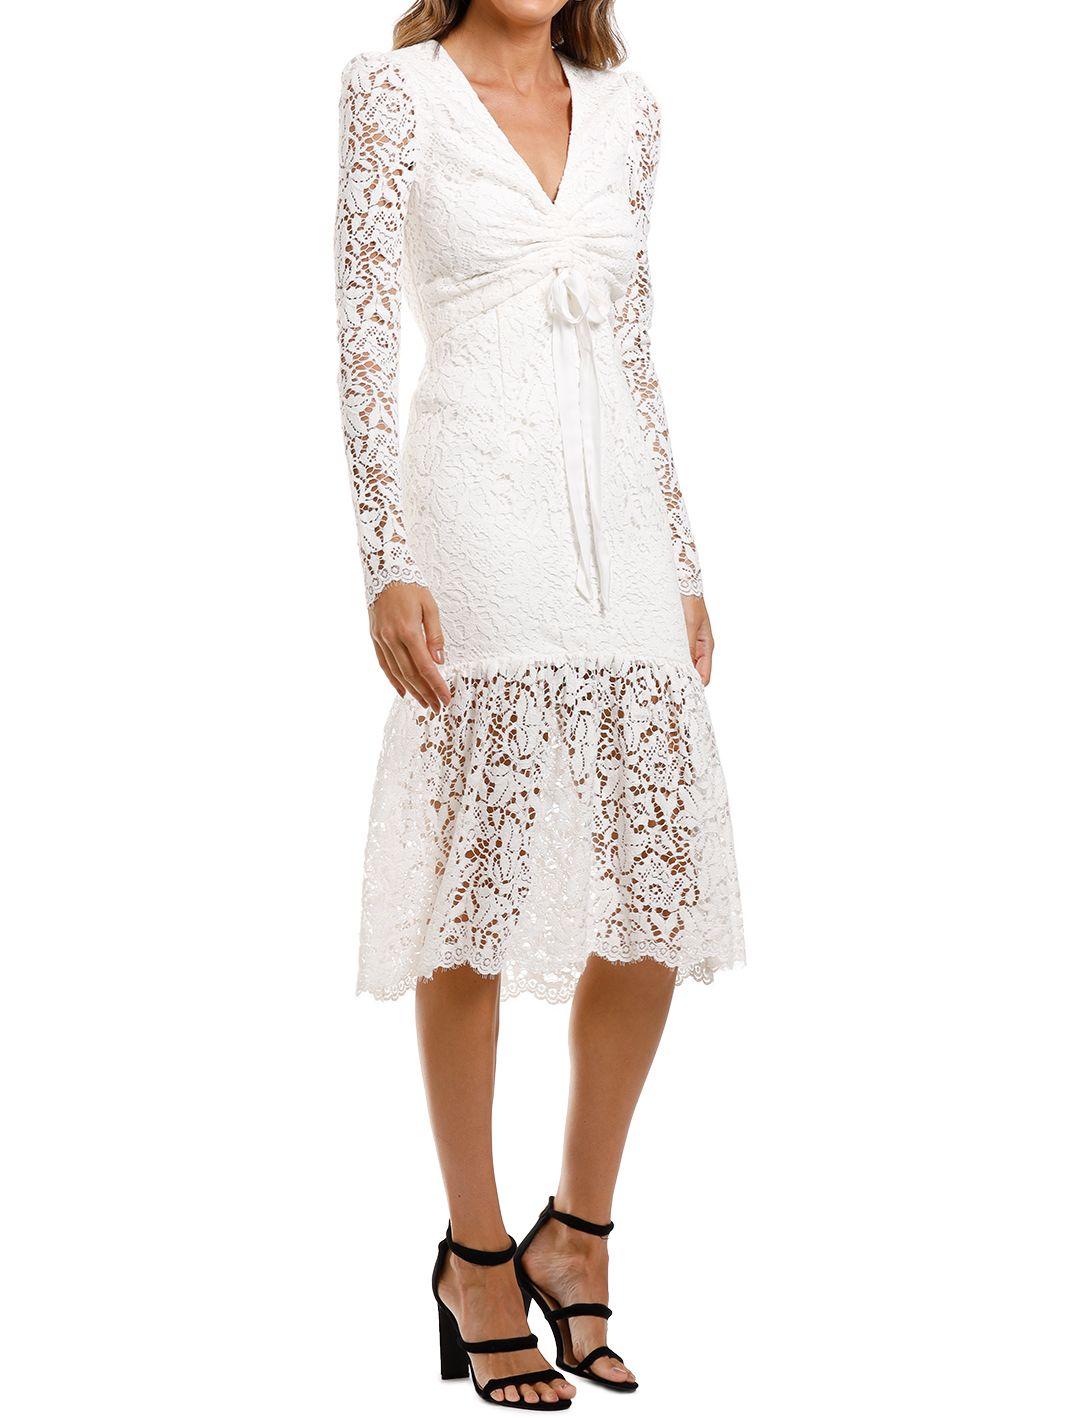 Rebecca Vallance Le Saint Ruched Dress White Lace